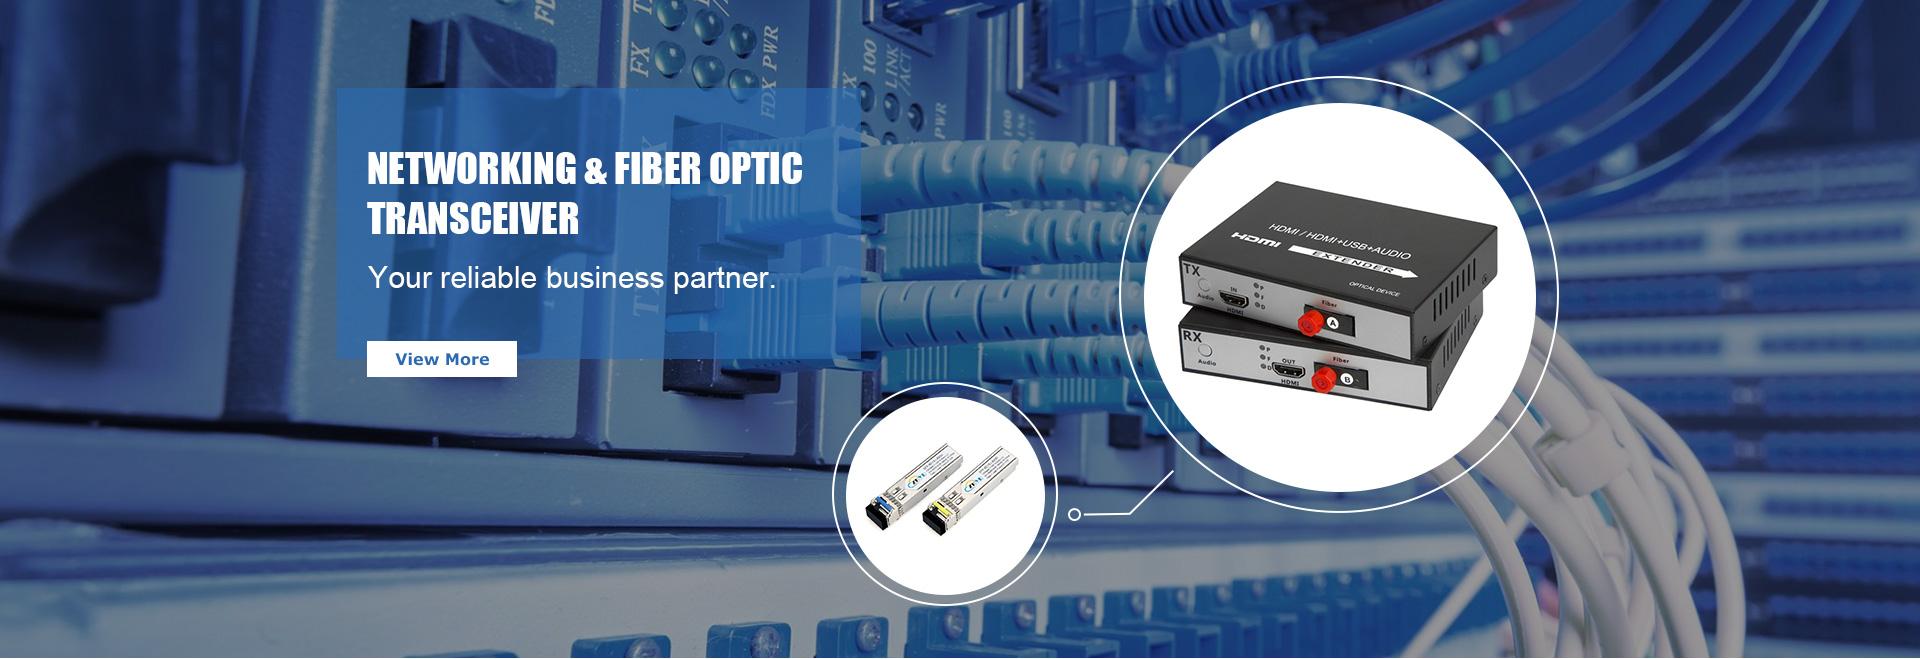 Power Optical Fiber Cable